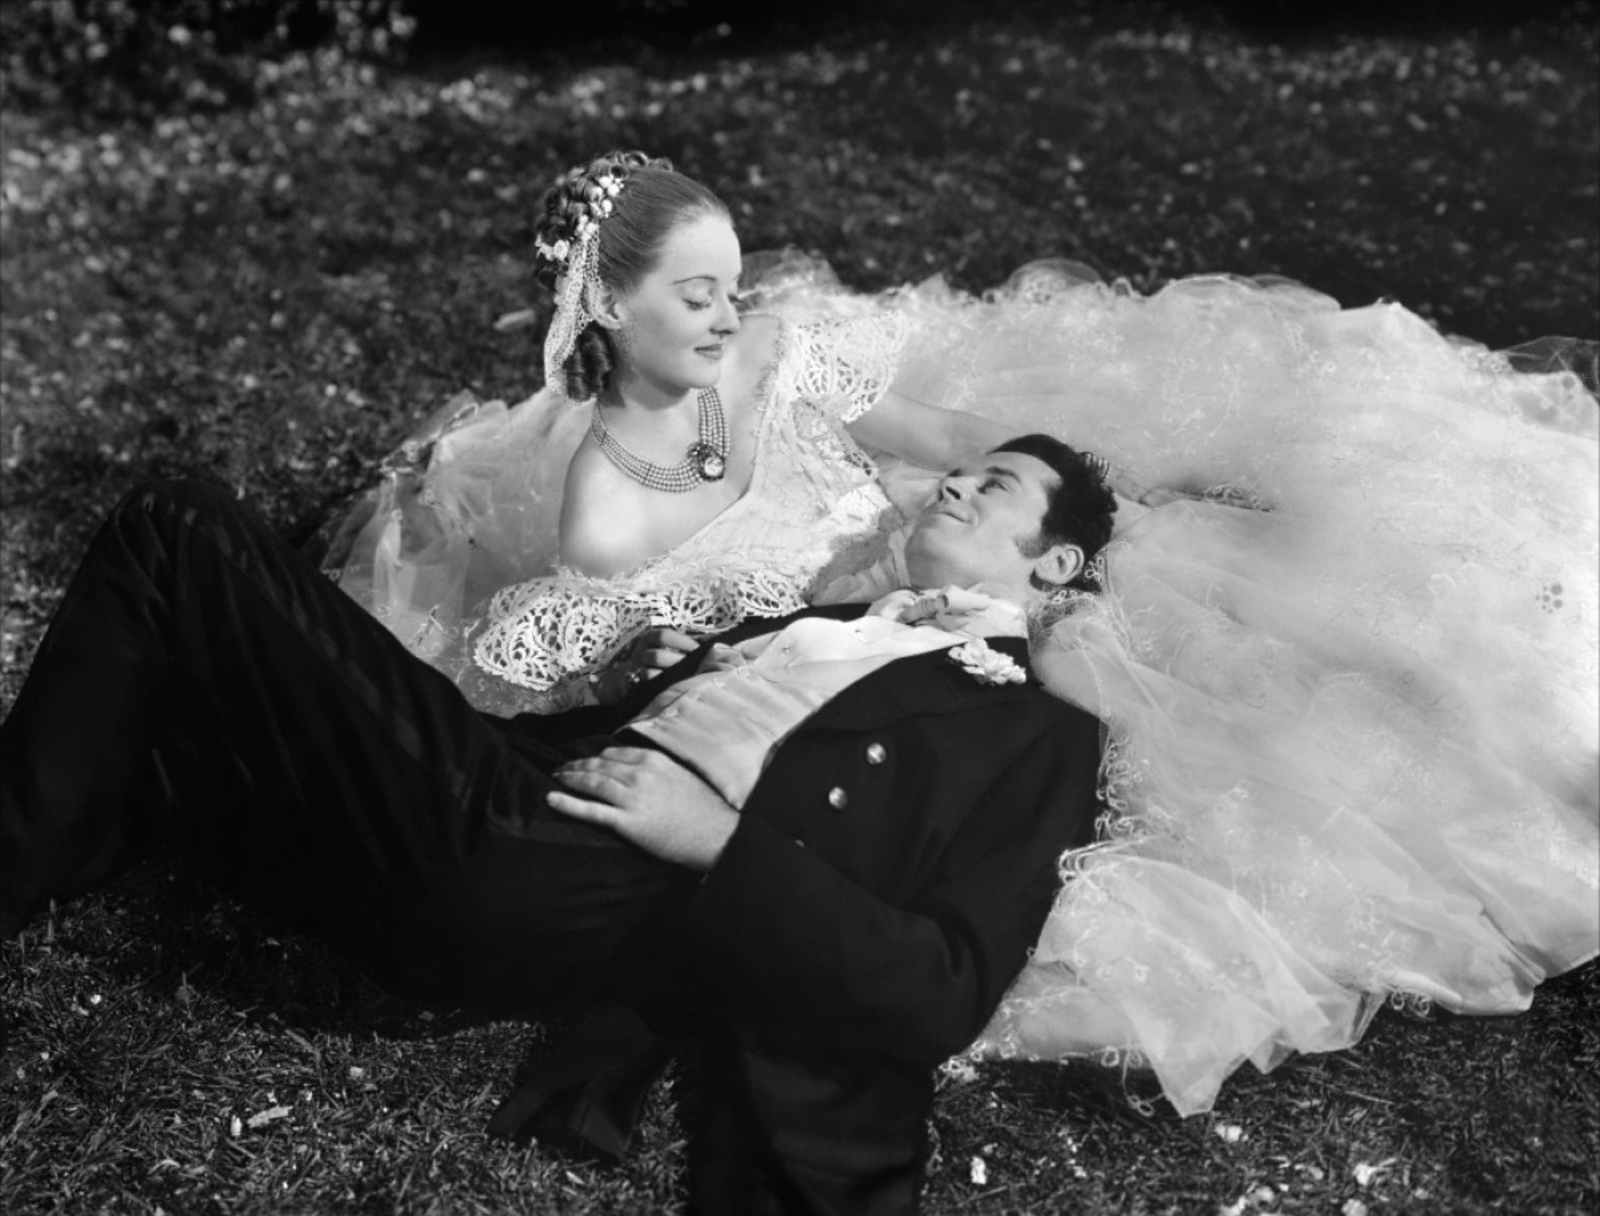 Bette Davis with Henry Fonda